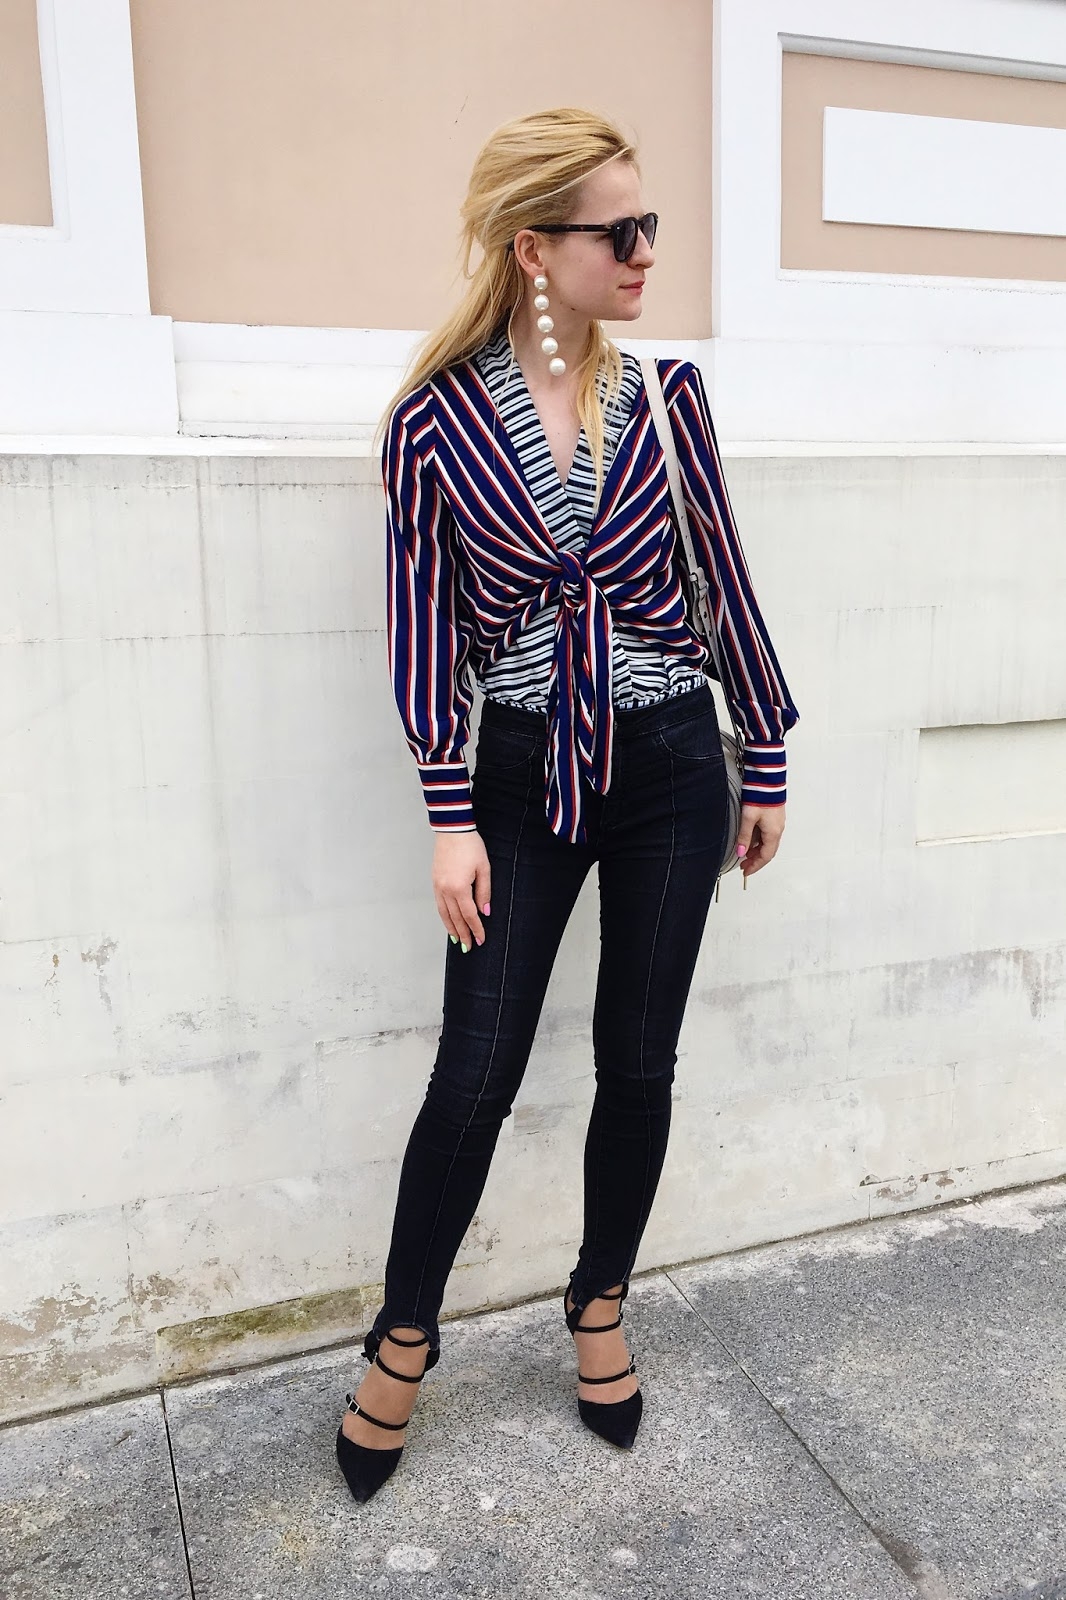 луки лето, модные блоггеры, модный аутфит, fashion trends, fashion trend stripe